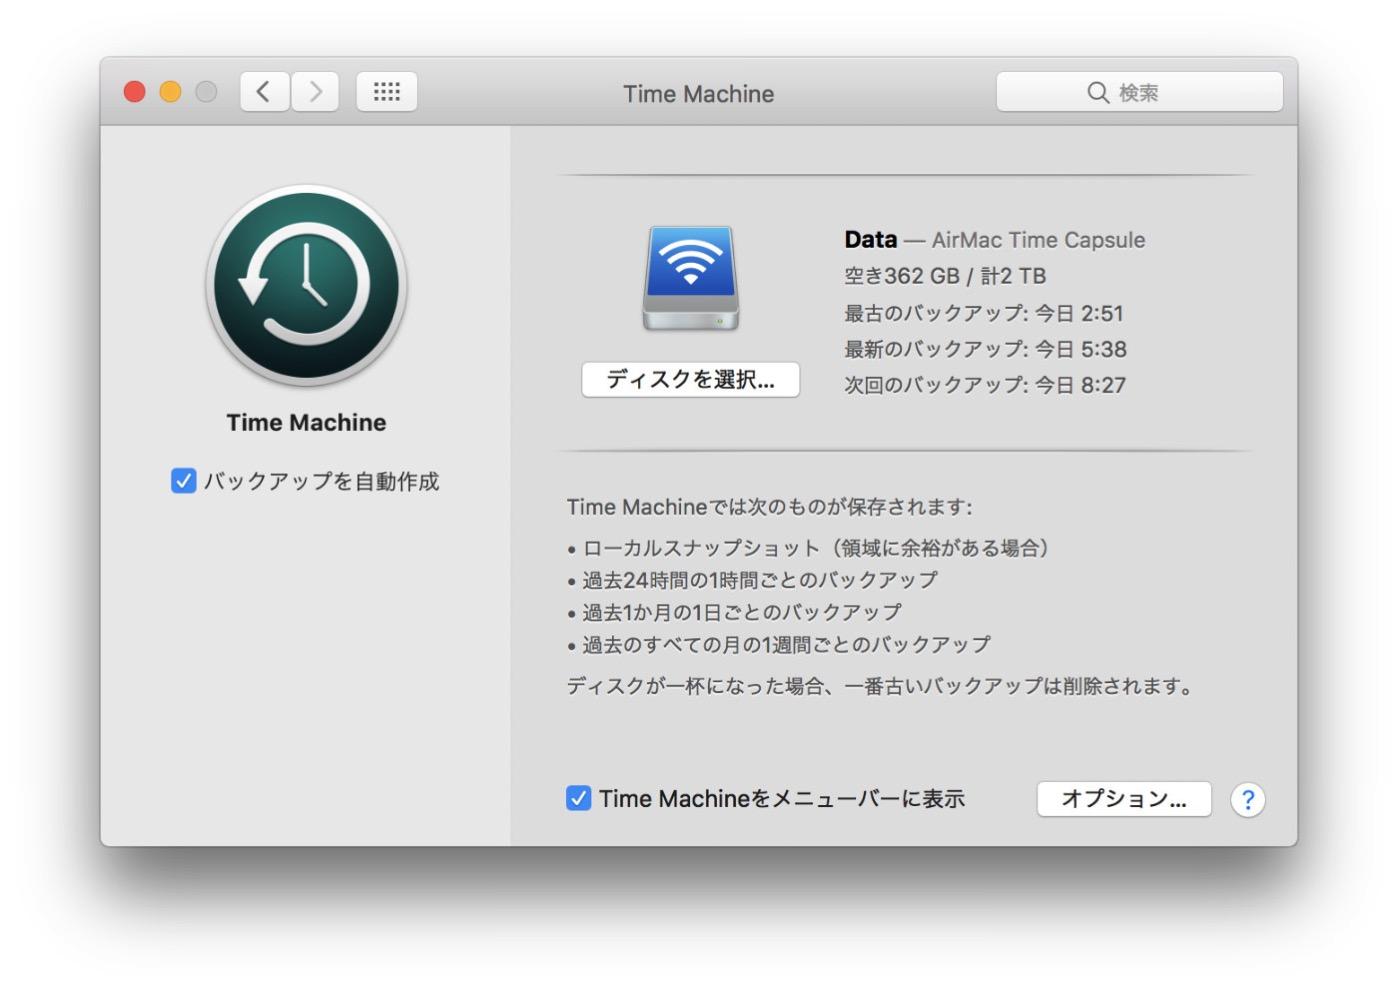 MacBook Pro 15 Backup-10